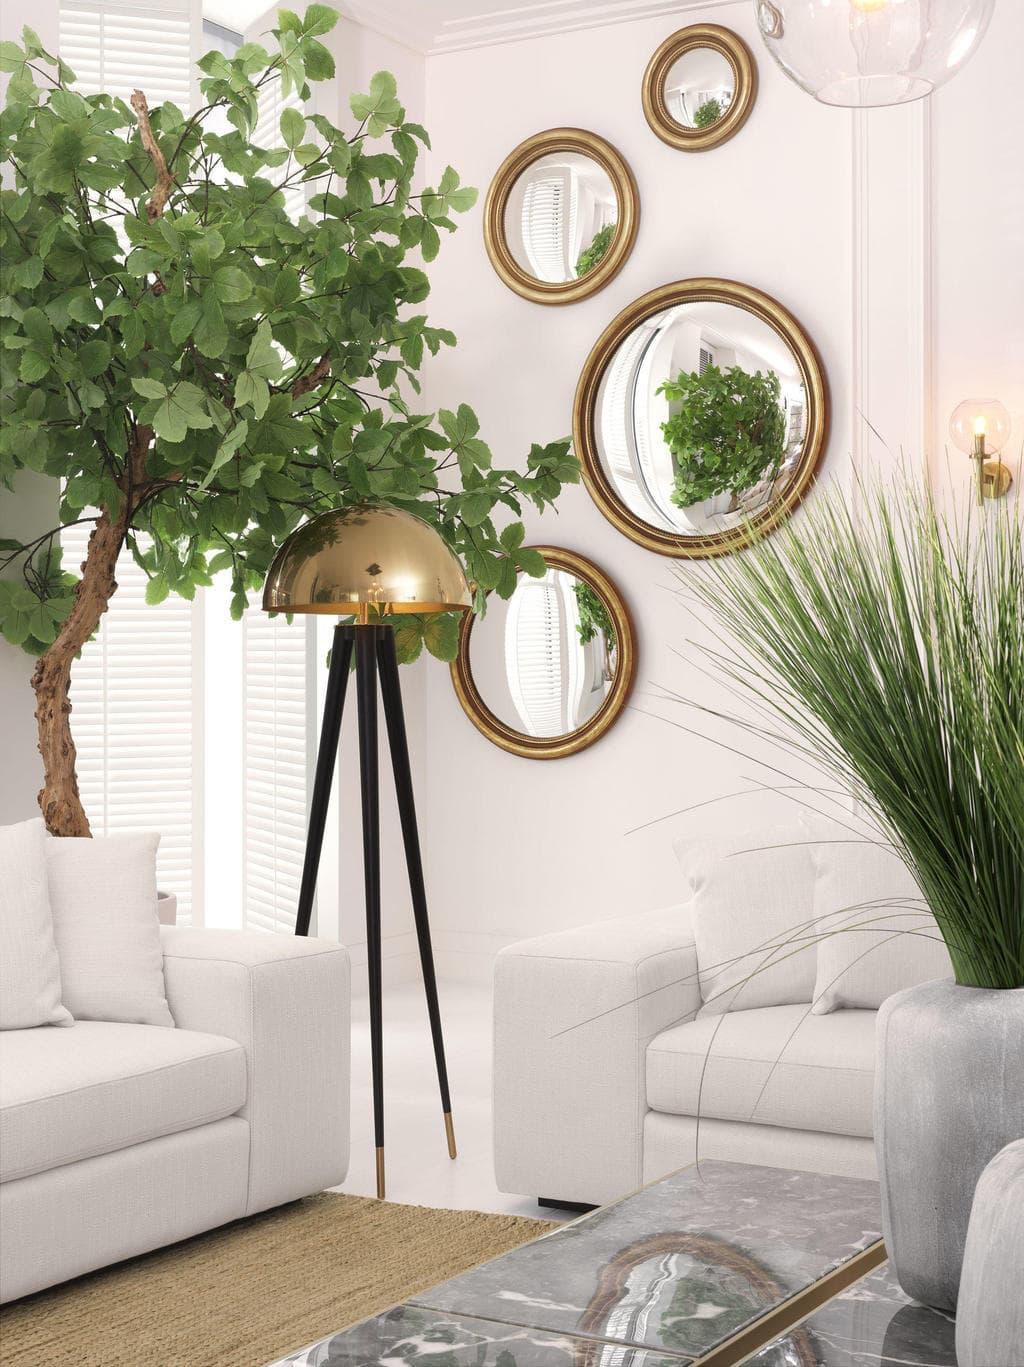 Furniture   Lighting   Accessories